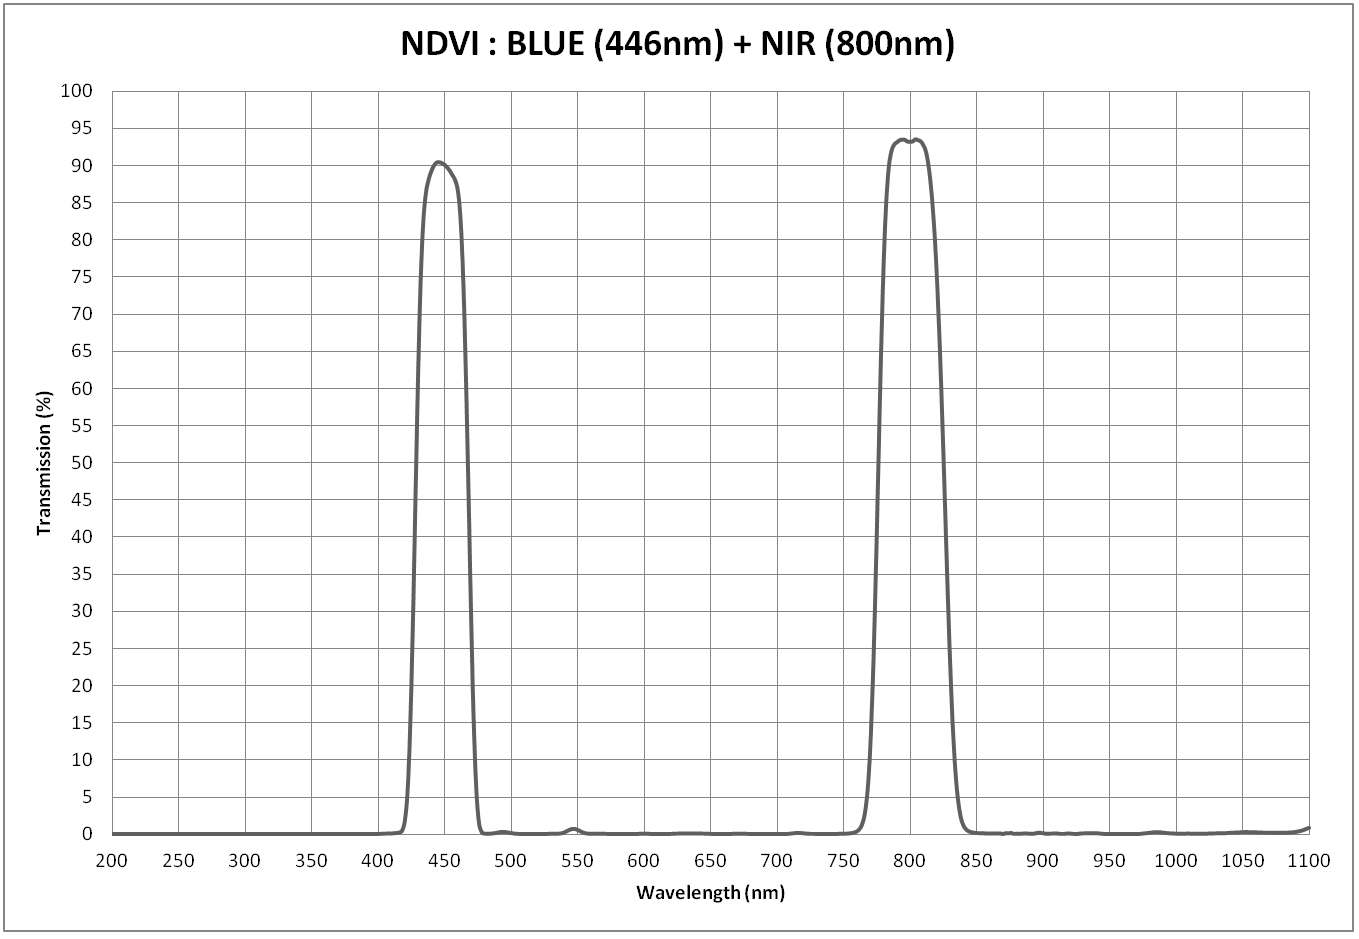 ndvi-blue-nir.jpg